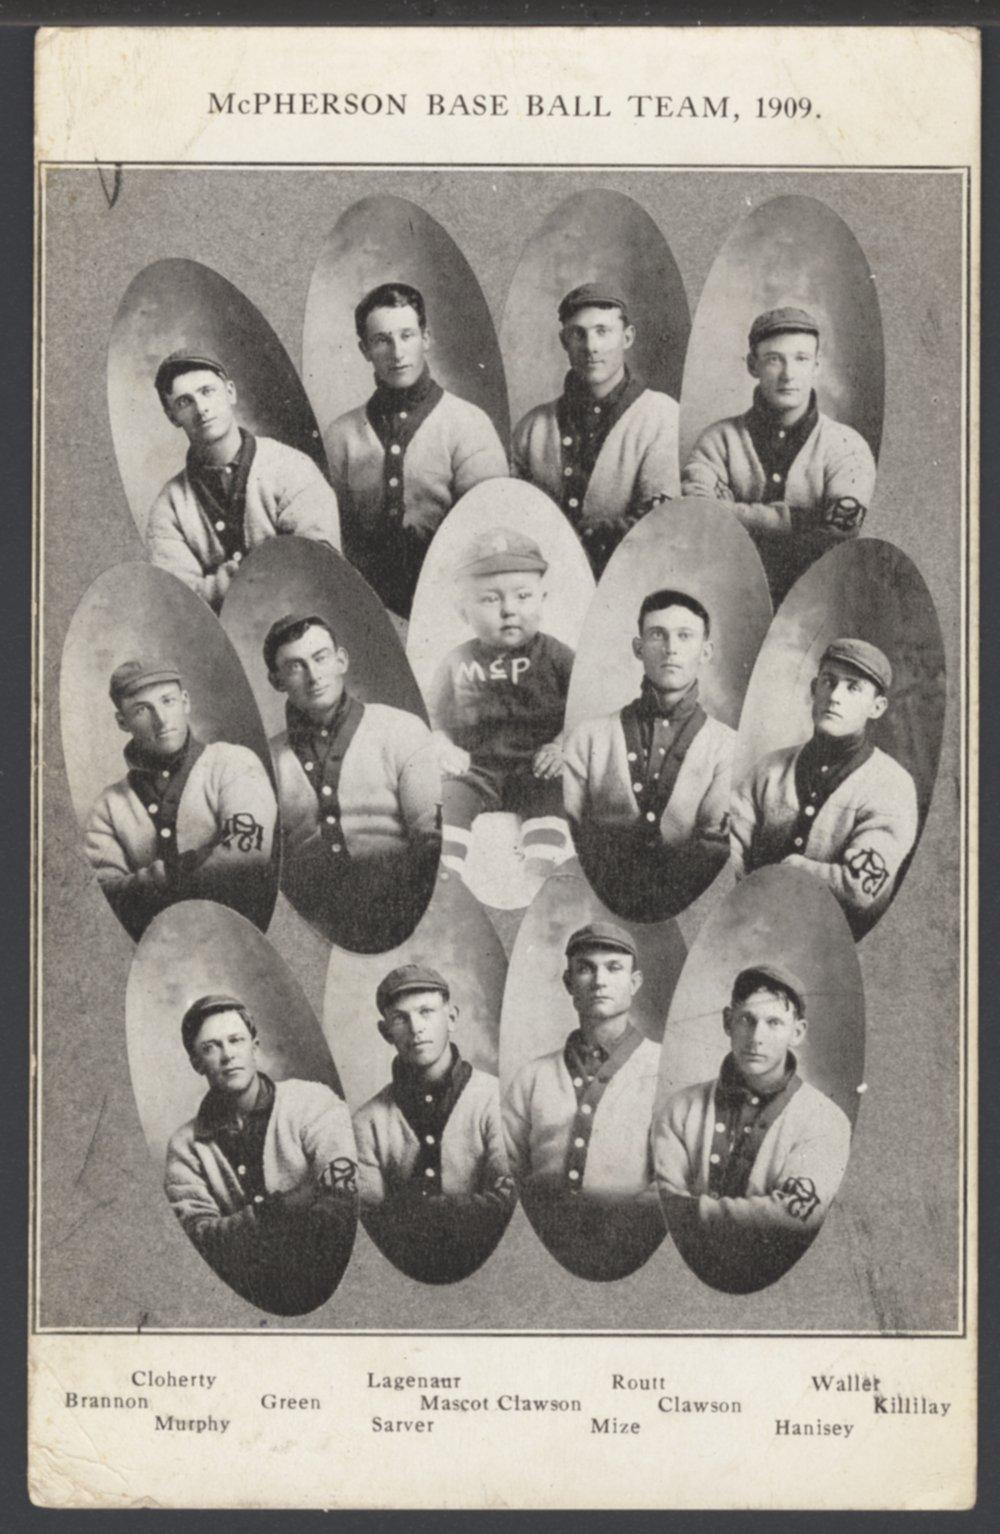 Baseball team, McPherson, Kansas - 1